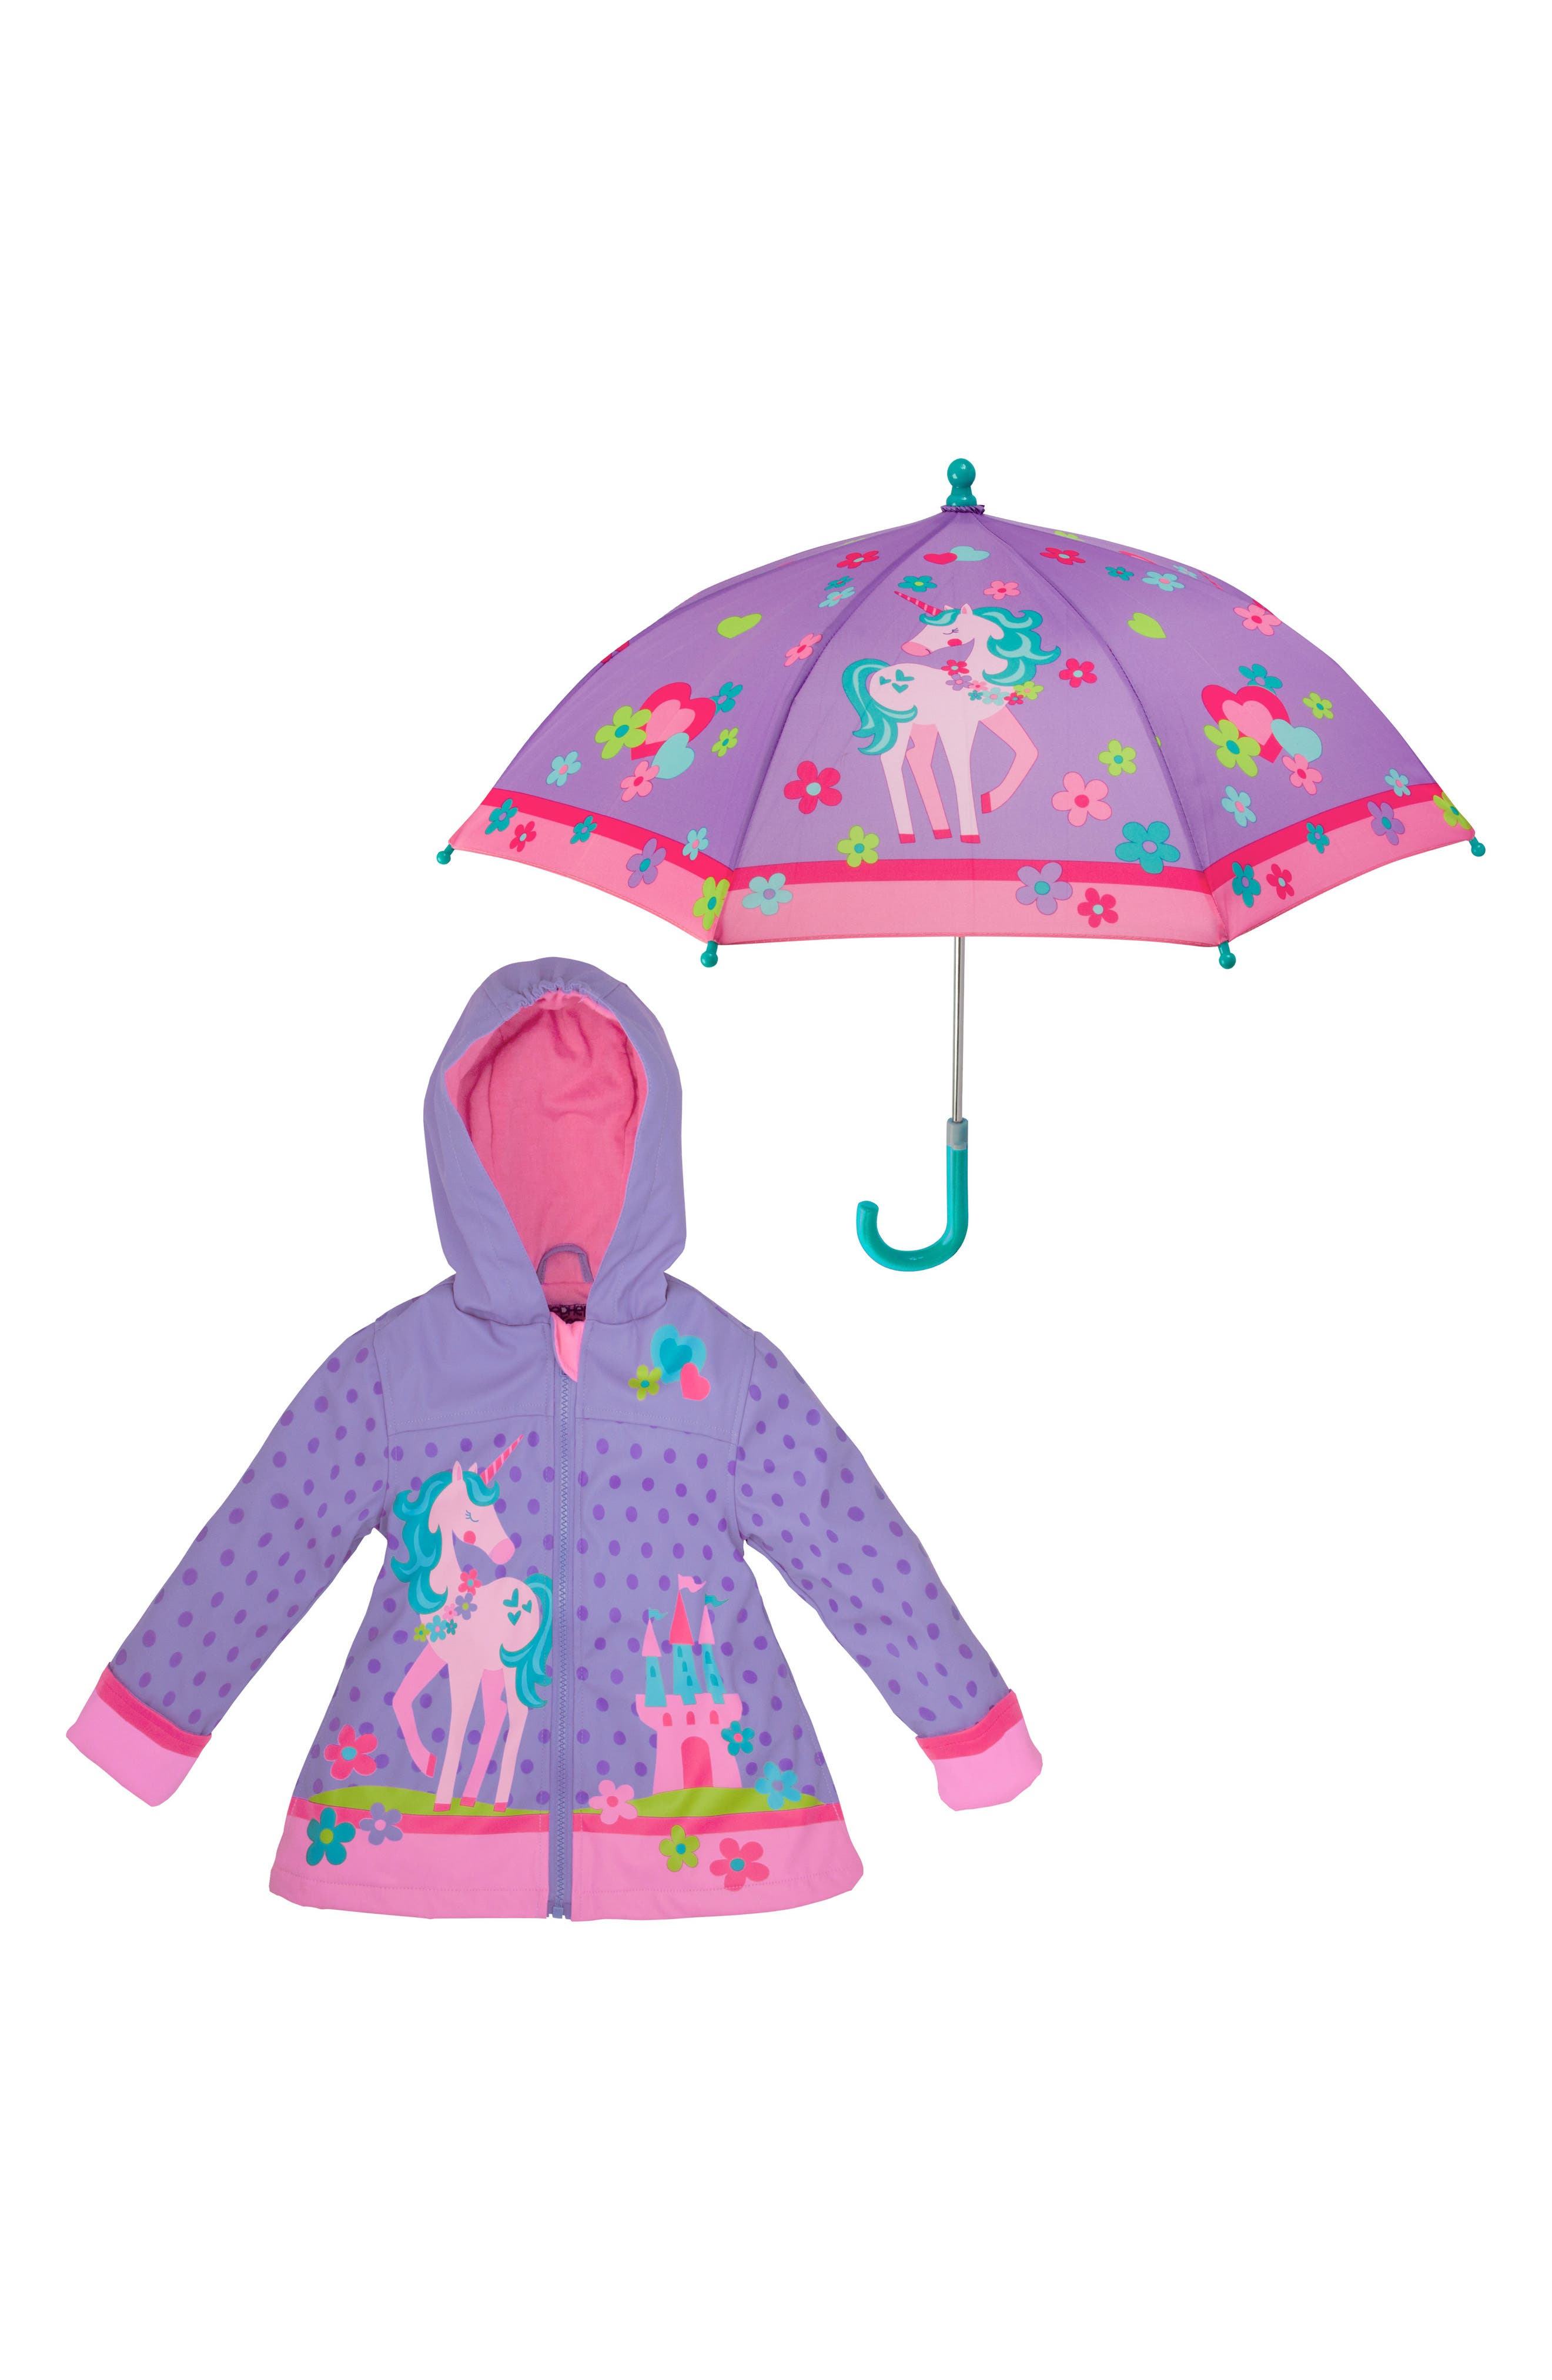 Unicorn Raincoat & Umbrella Set,                             Main thumbnail 1, color,                             UNICORN